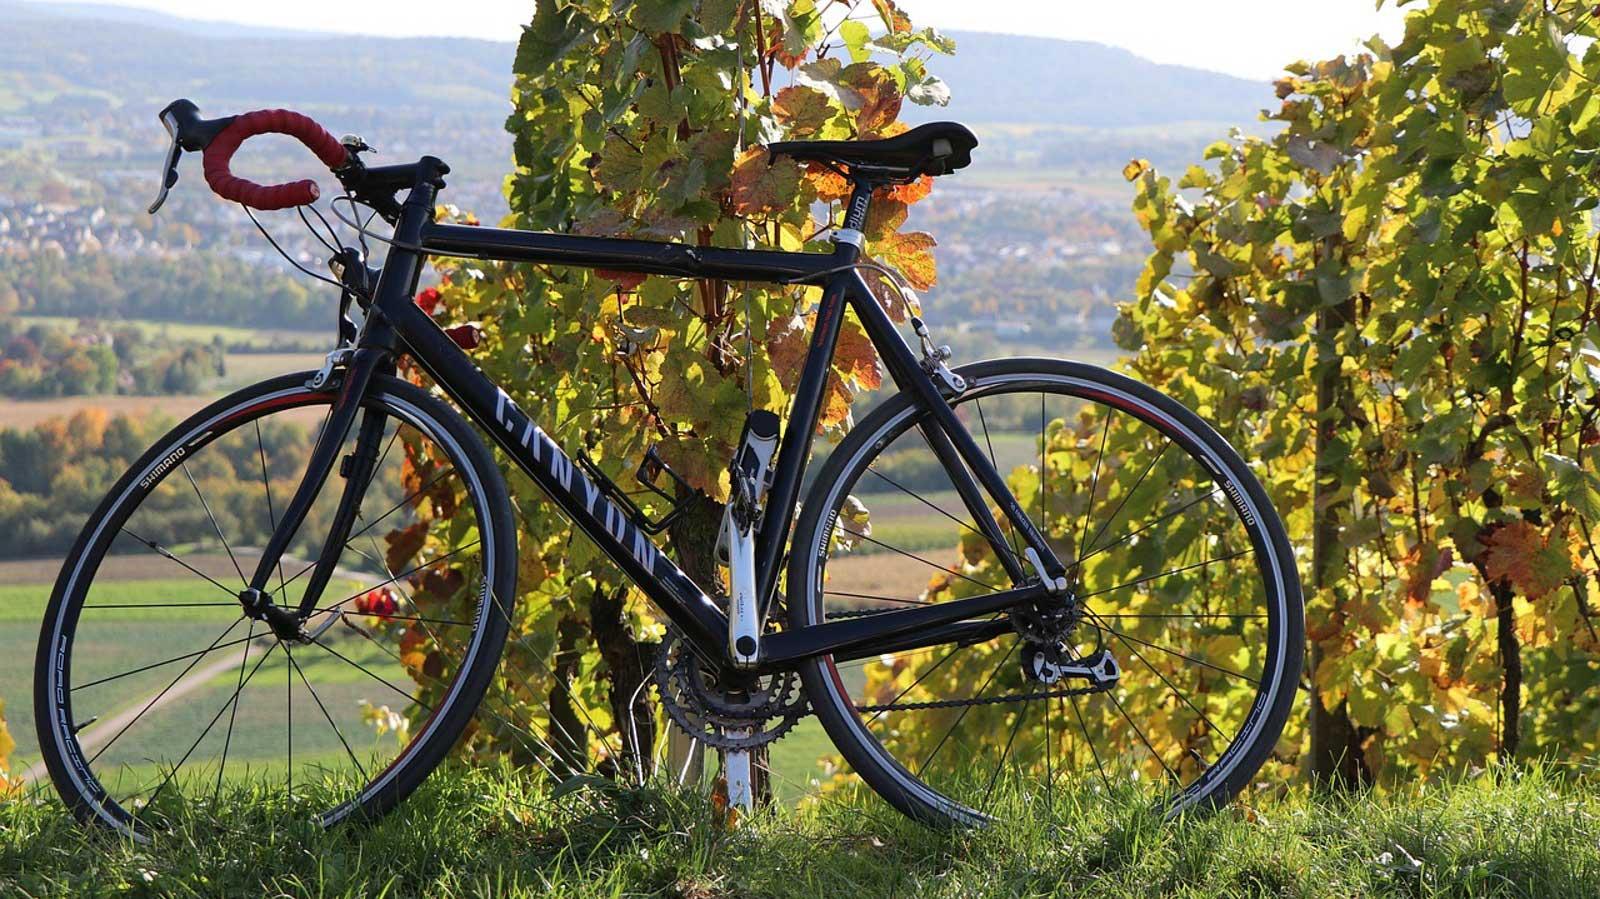 soave wine tour bici